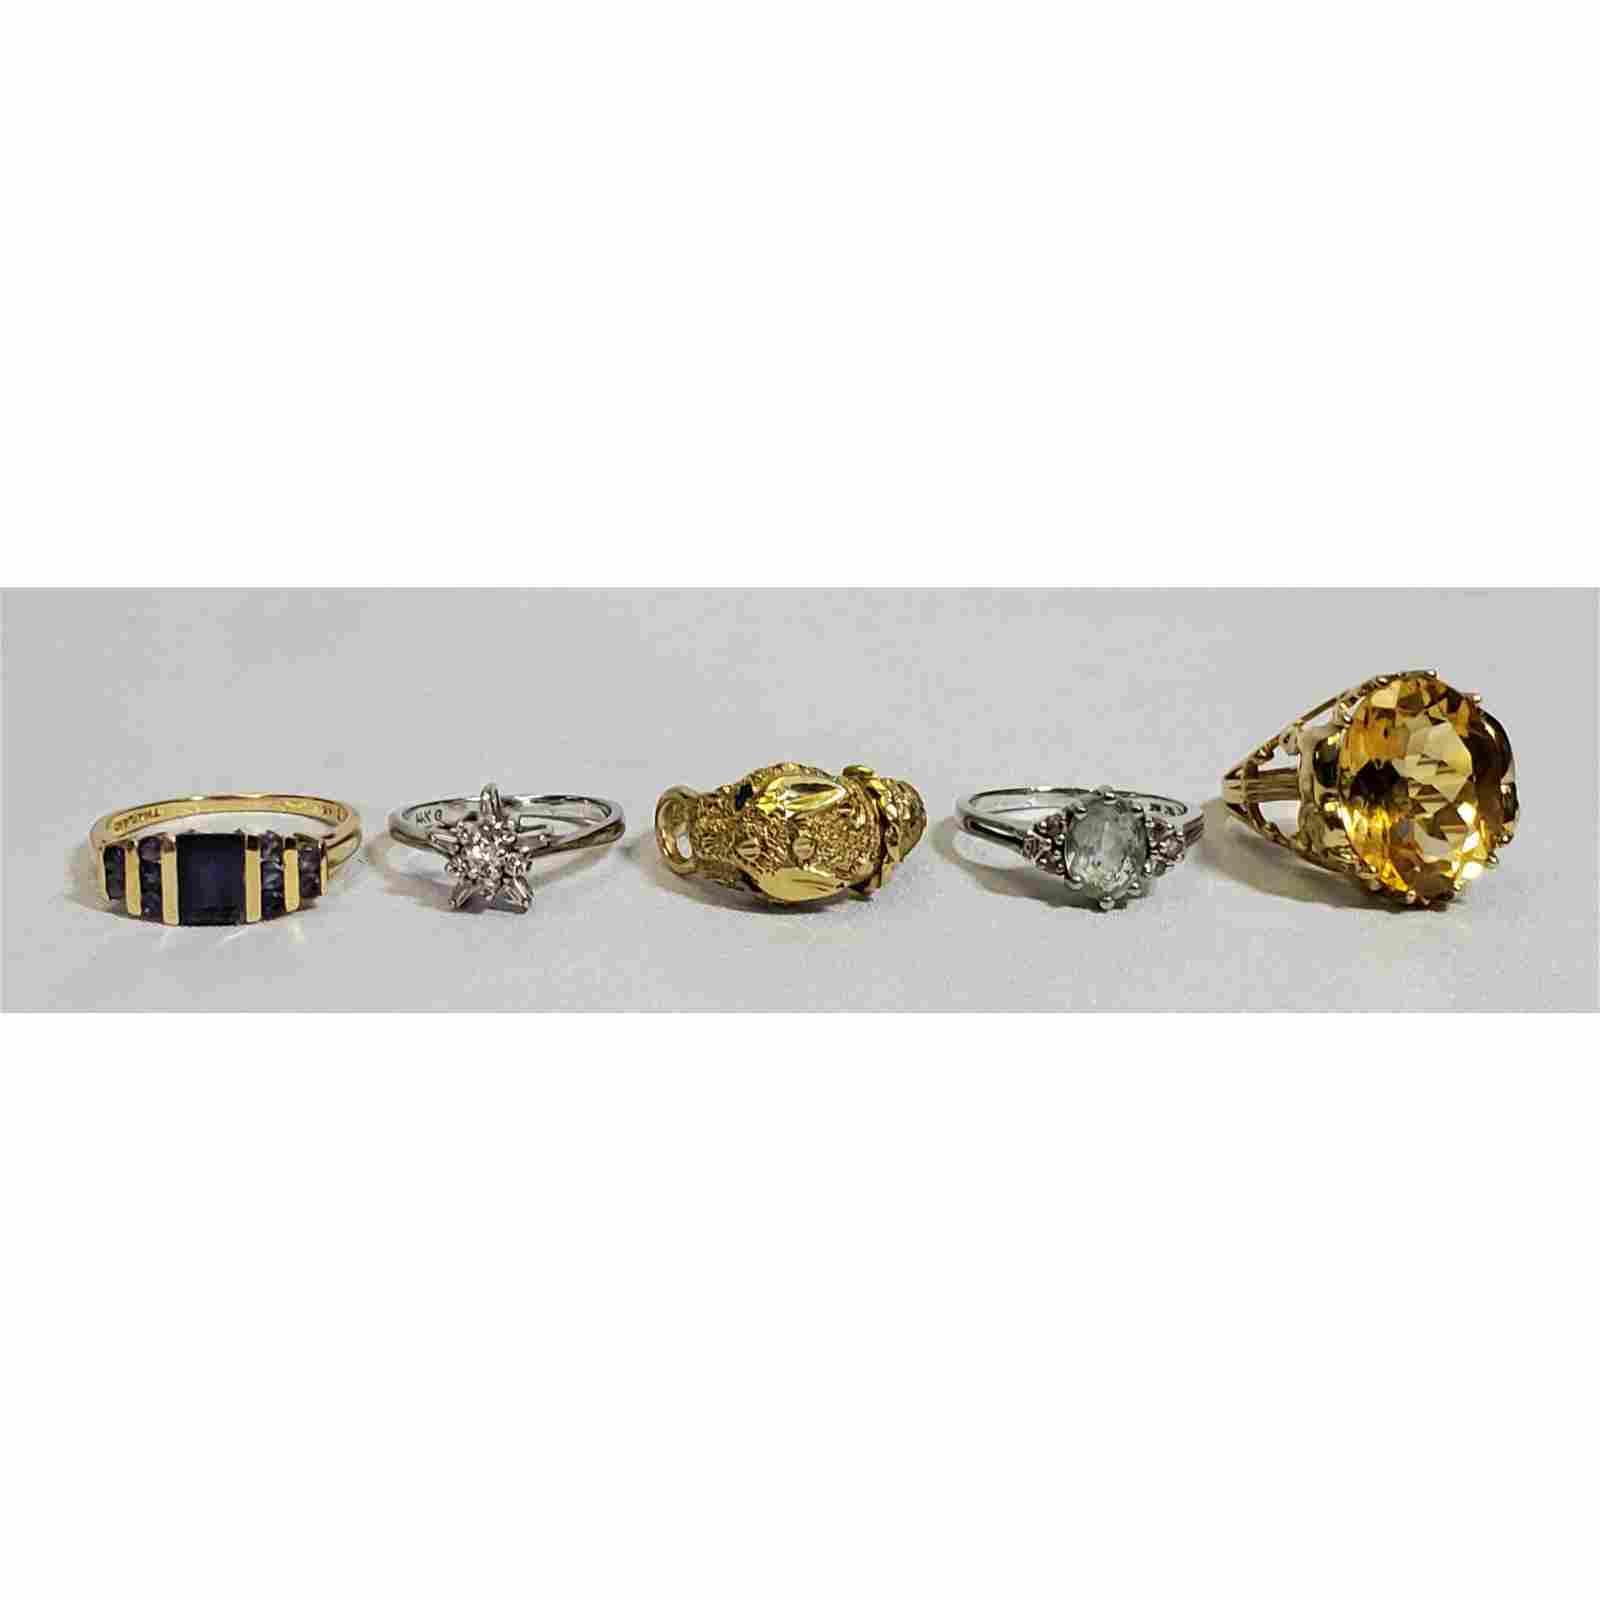 (5) 14 k Gold Estate Rings w/ Gemstones 18.8 Grams